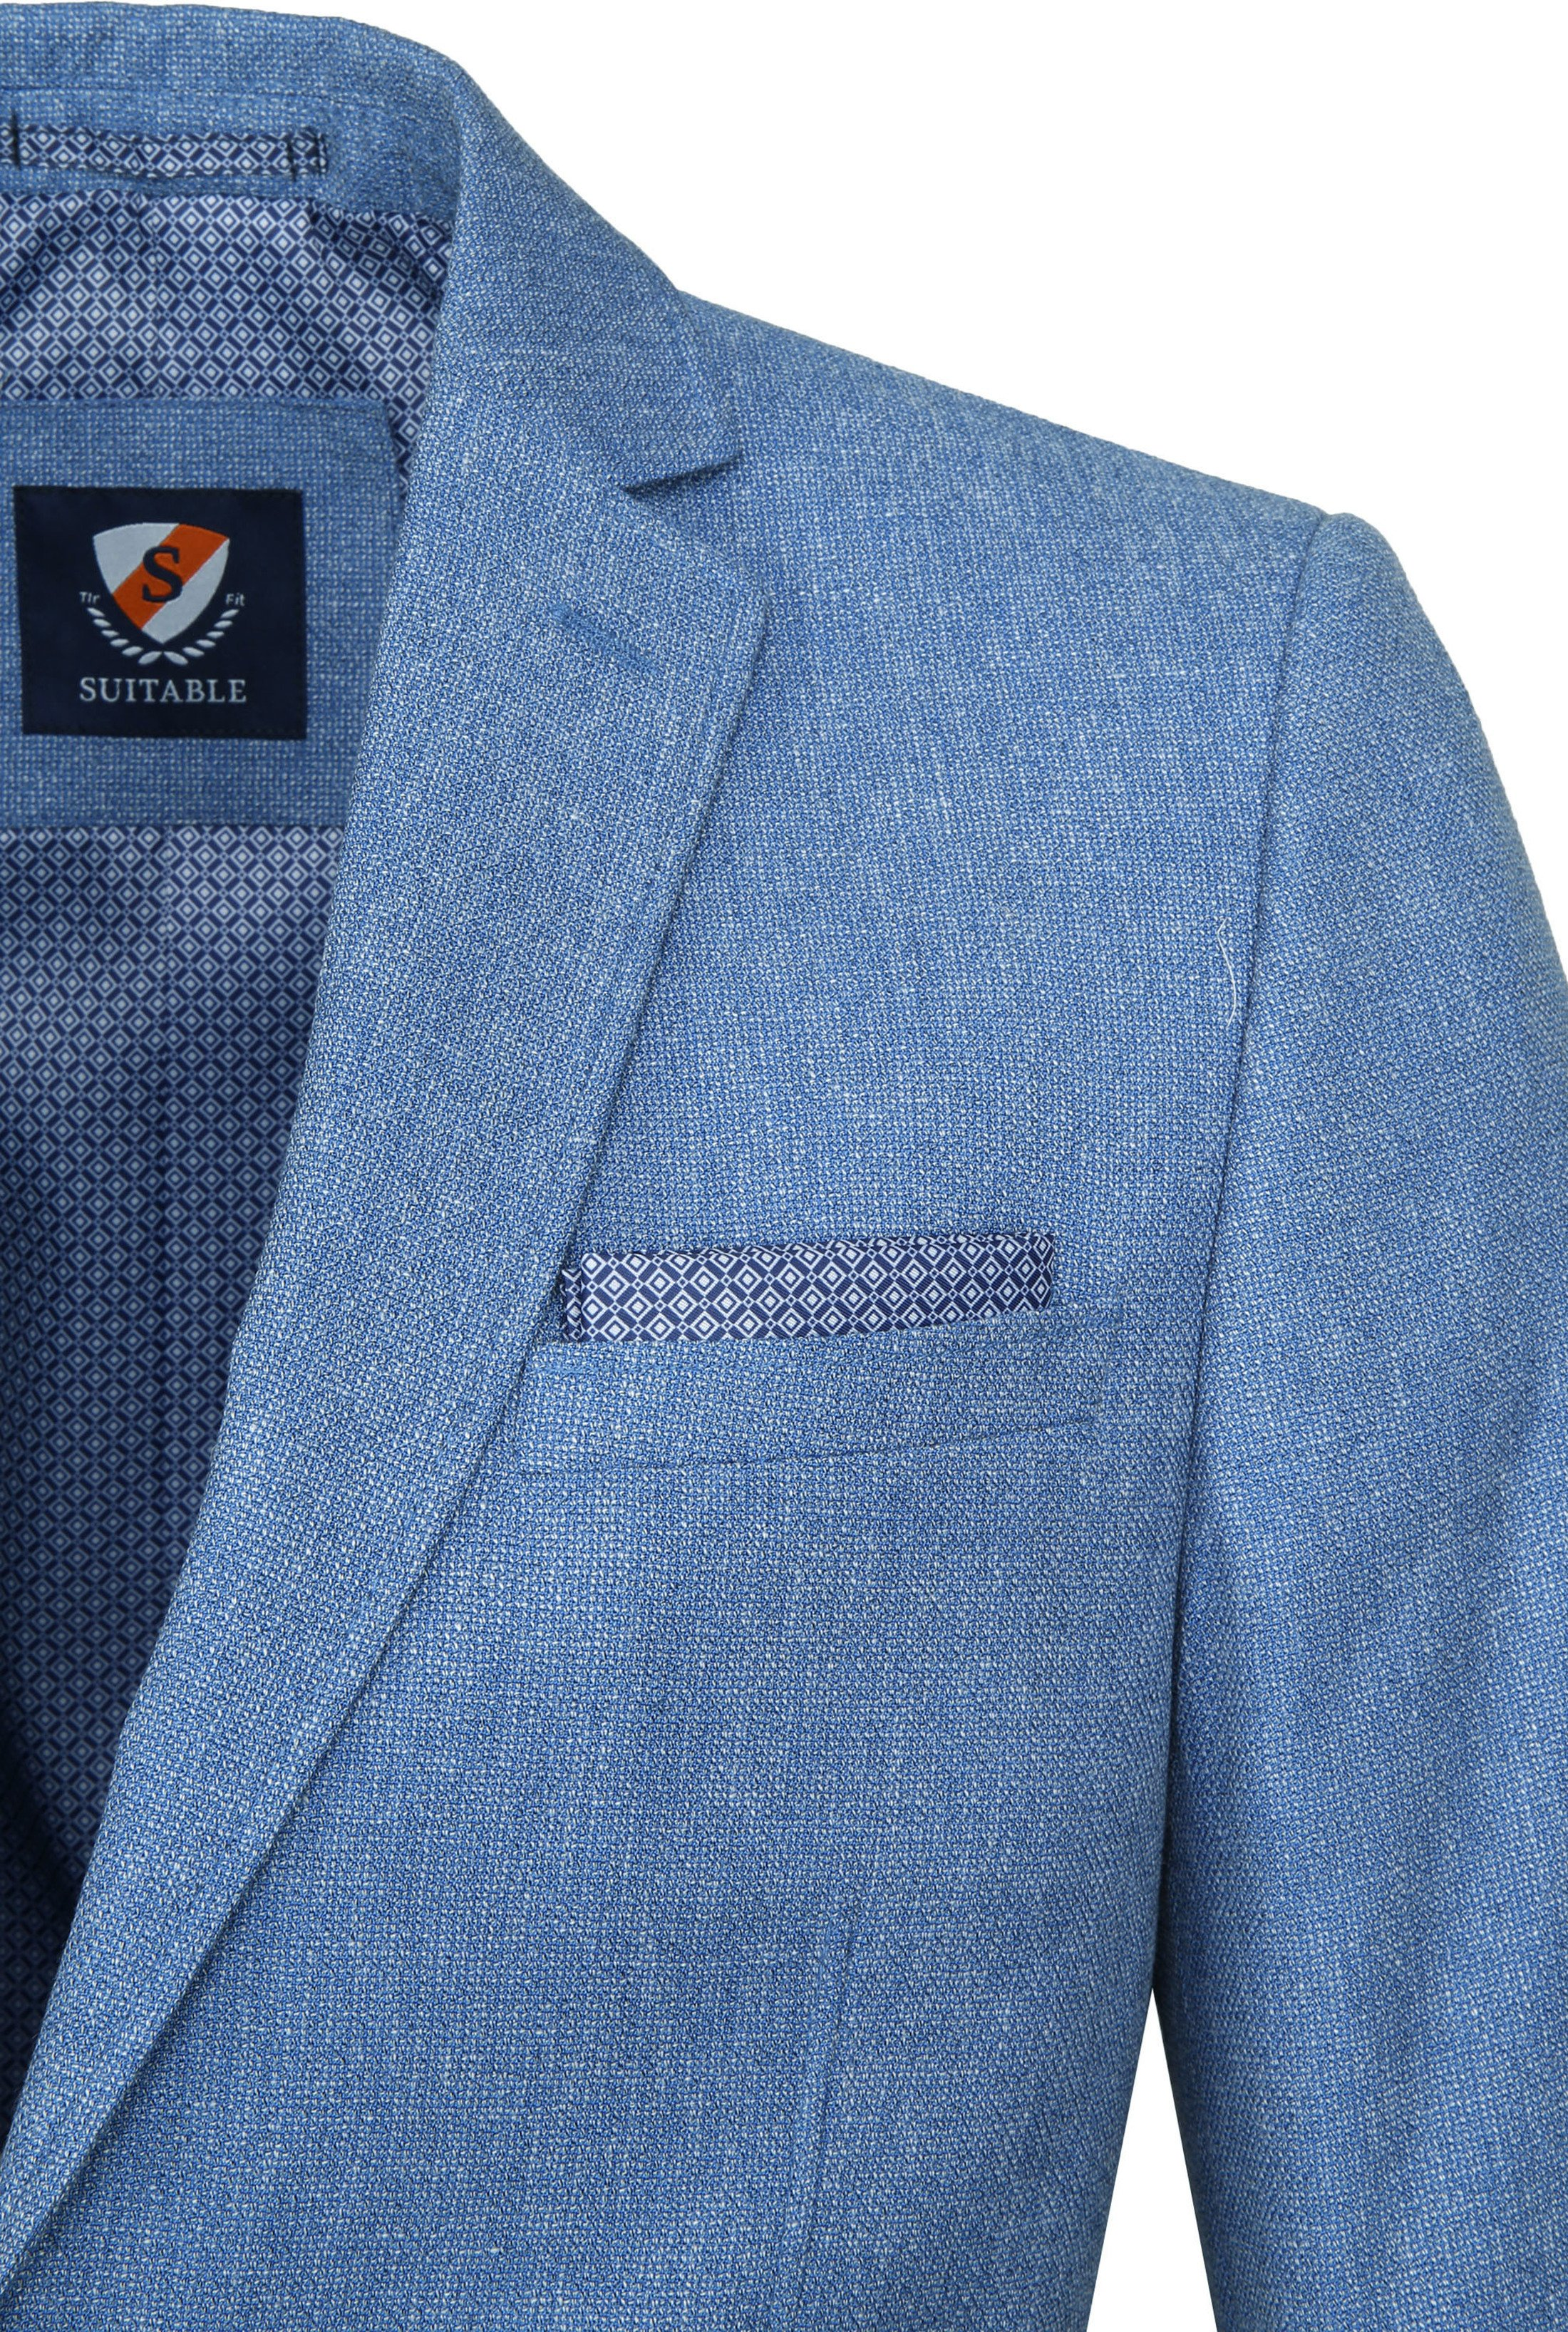 Suitable Blazer Tolo Lichtblauw foto 1